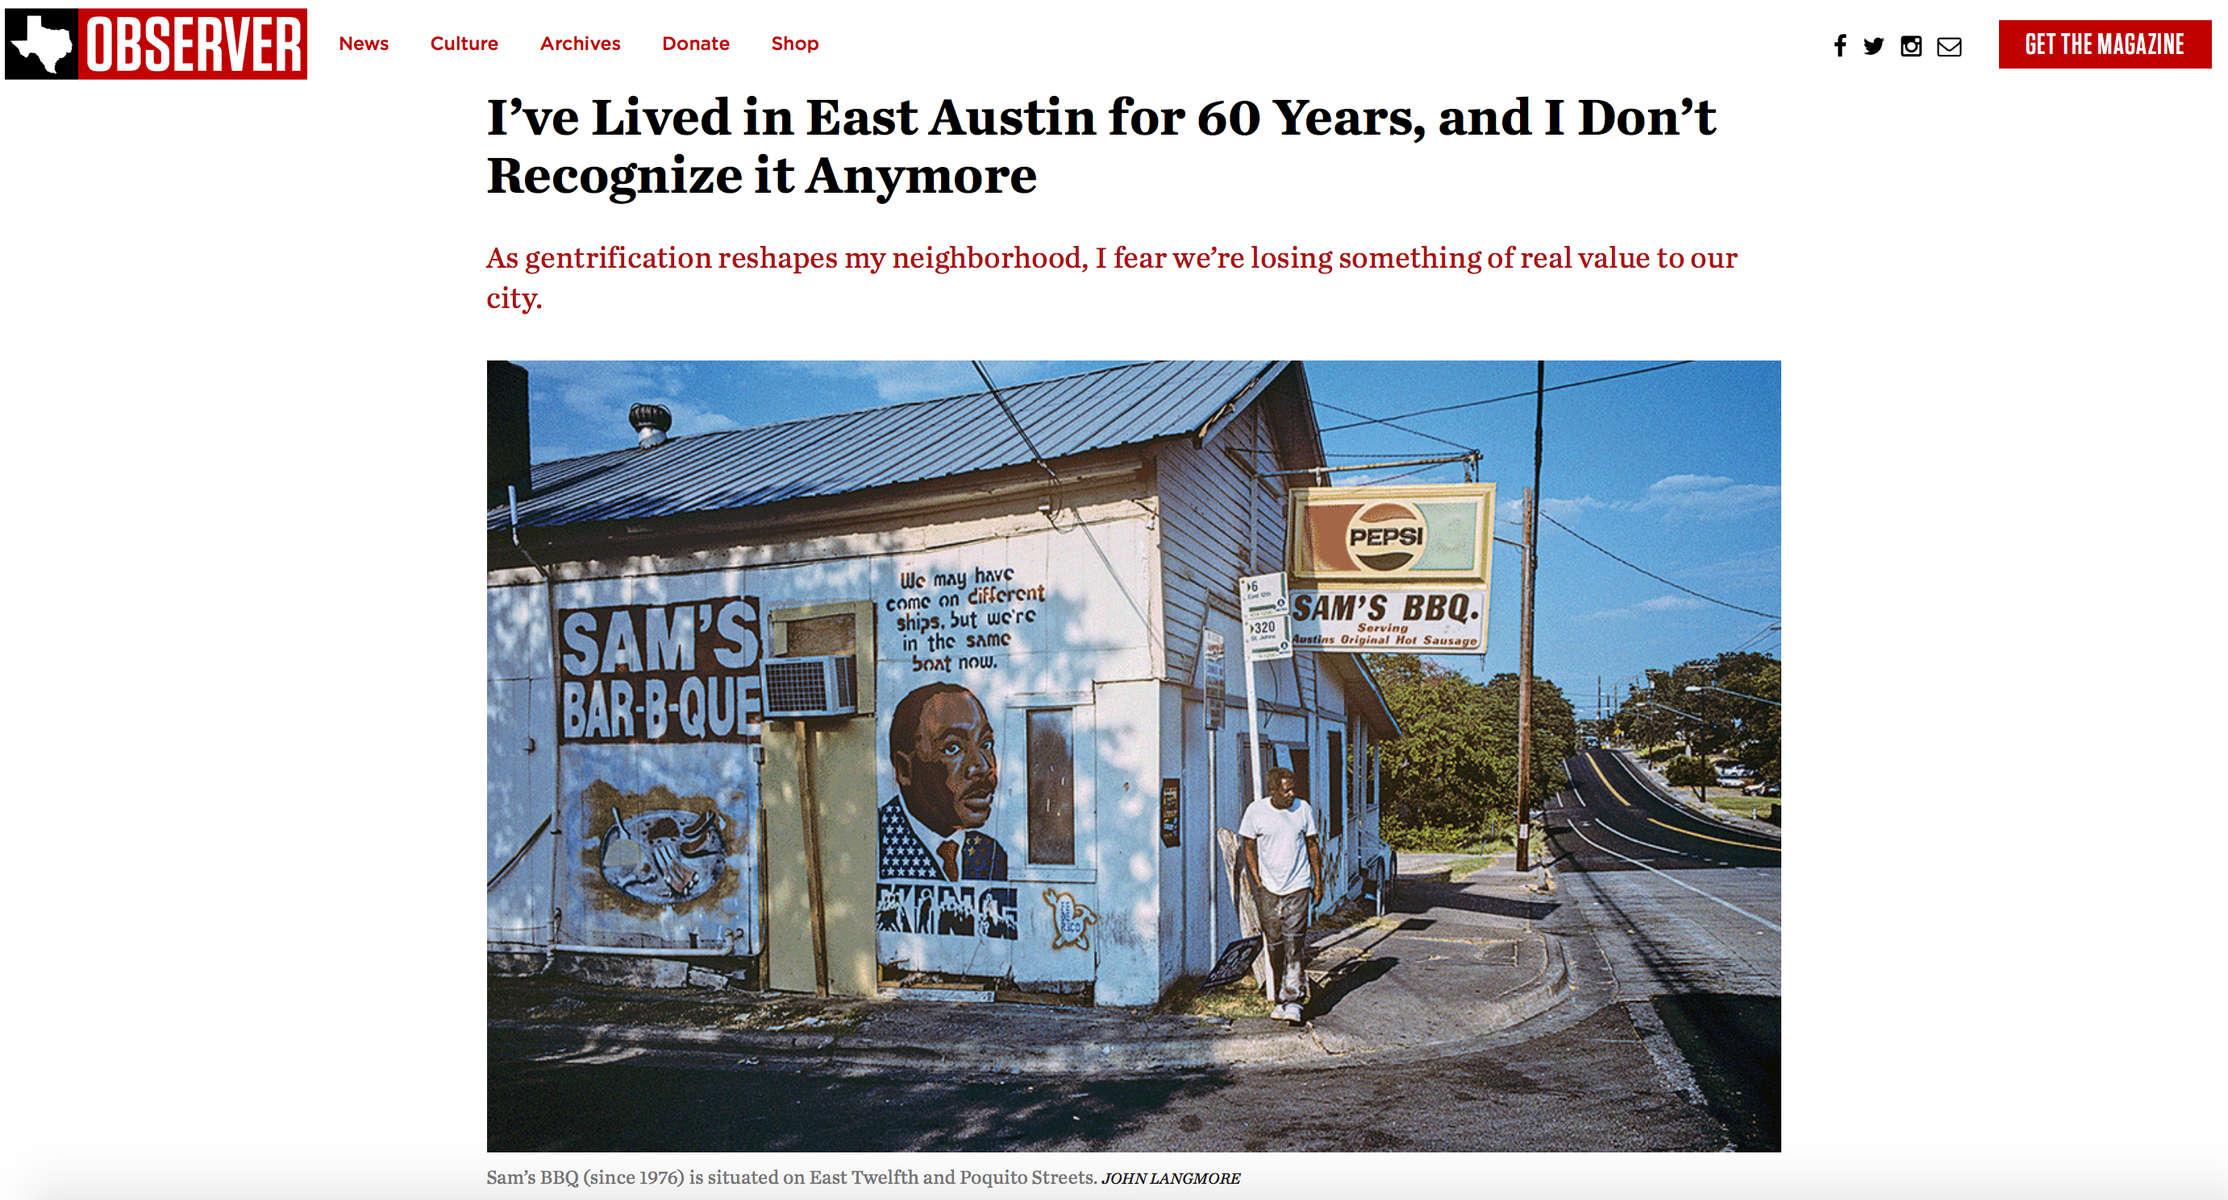 Texas Observer ran Ms. Delco's poignant essay about East Austin.